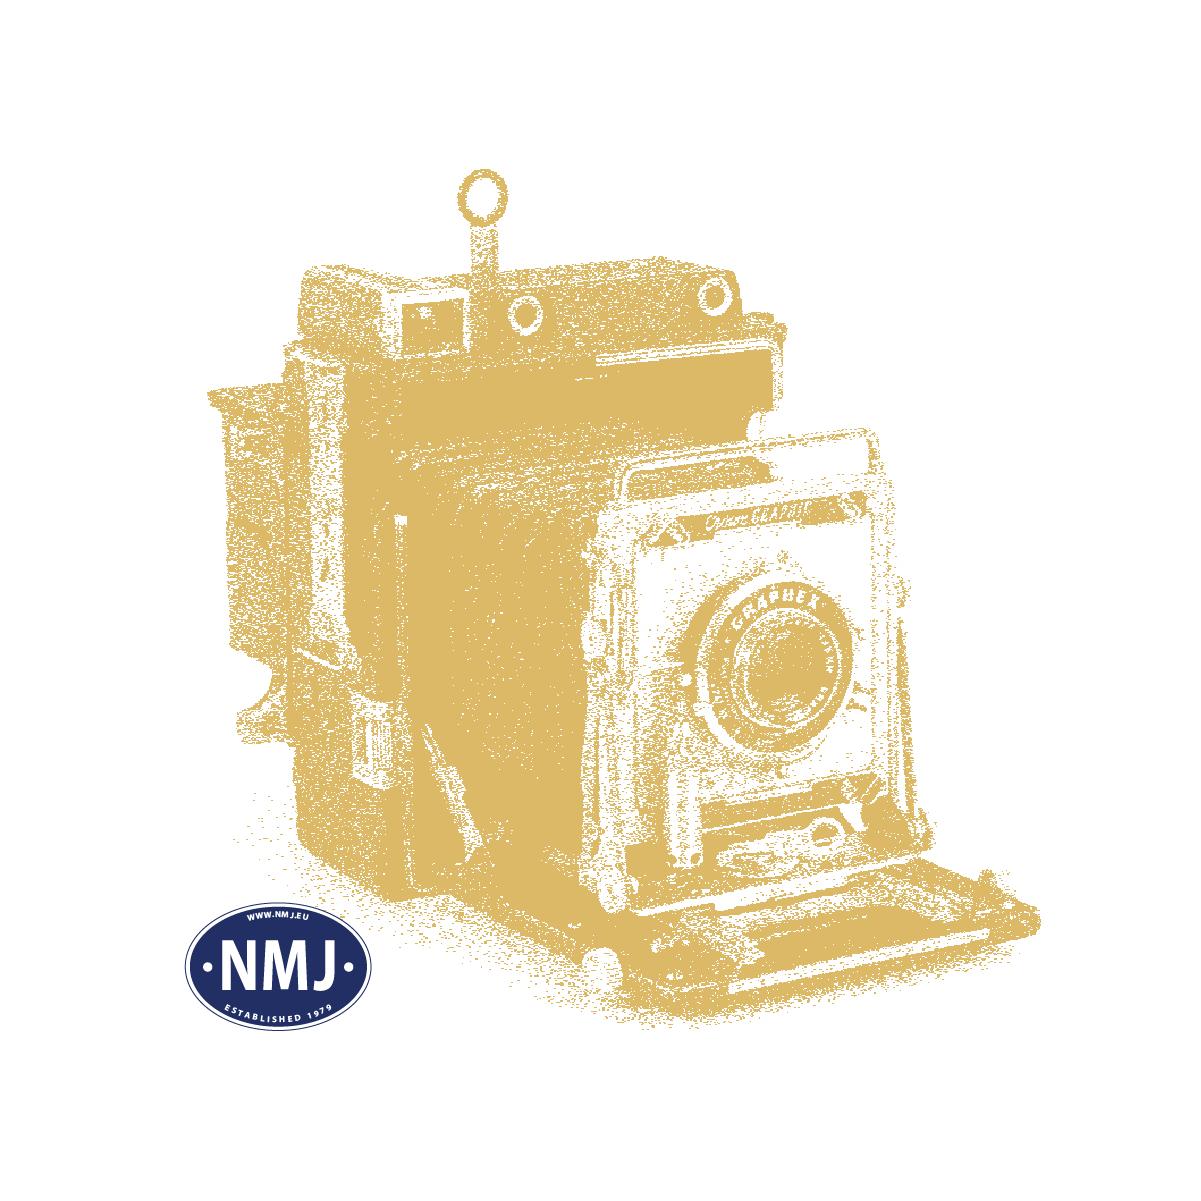 NMJT507.112 - NMJ Topline CargoNet Lgns 42 76 443 2141-6, Tollpost-Globe grønn/gul